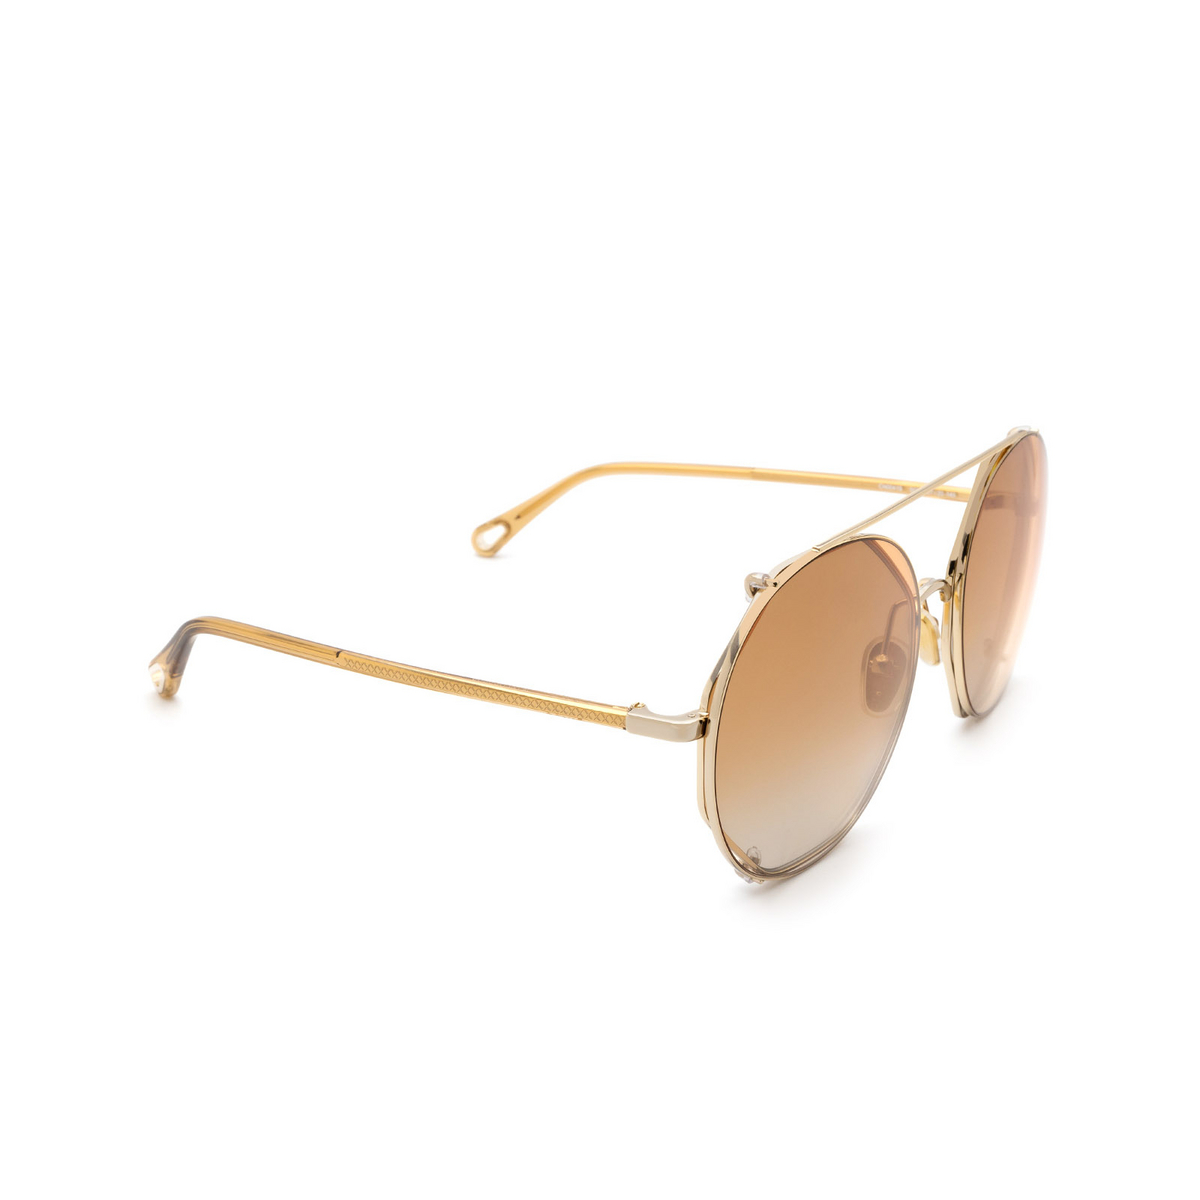 Chloé ® Round Sunglasses: CH0041S color Gold 002.